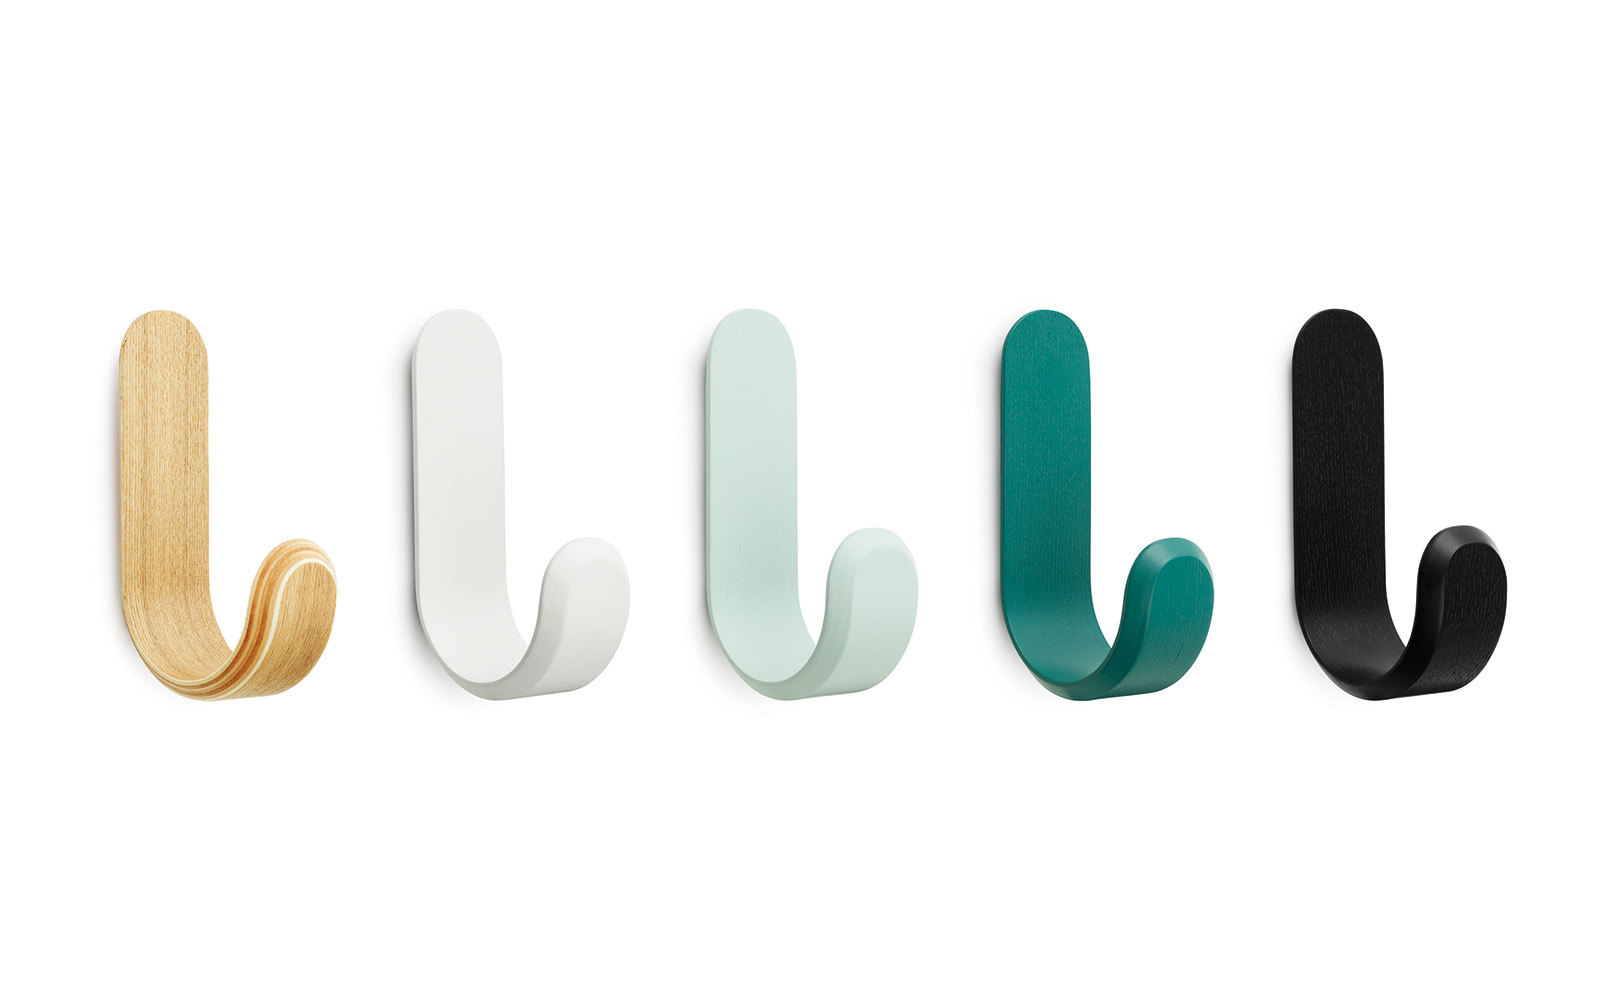 Furniture Designs Curve Hooks Wooden Hooks In Misty Green Lacquere Veneer